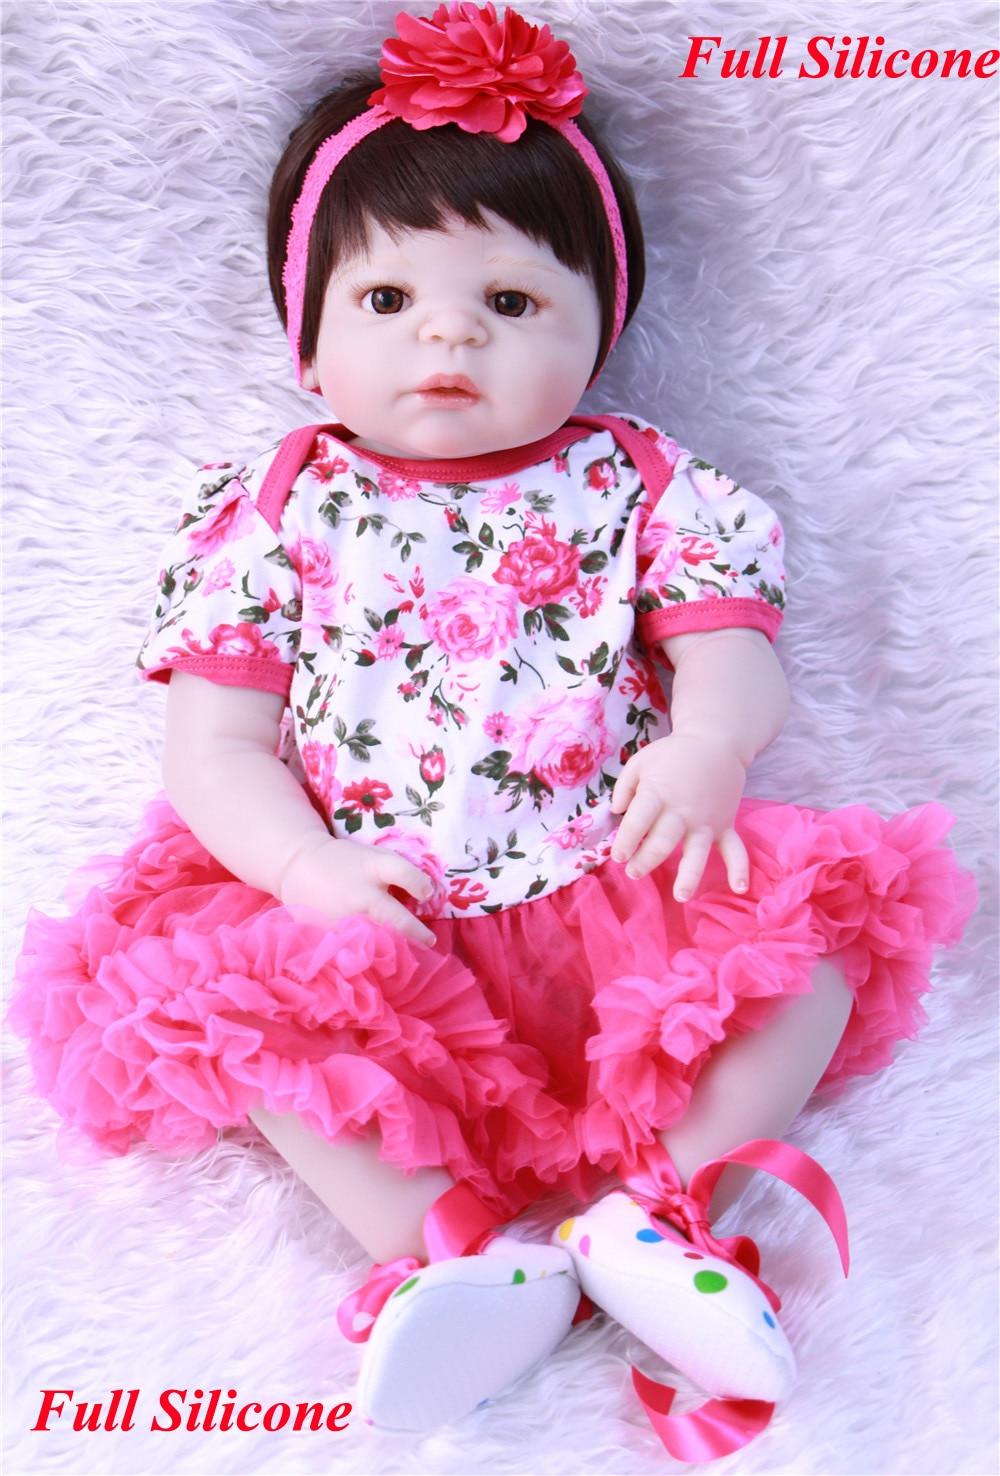 Realistic reborn baby NPK girl dolls 22 full body silicone reborn baby dolls for children gift